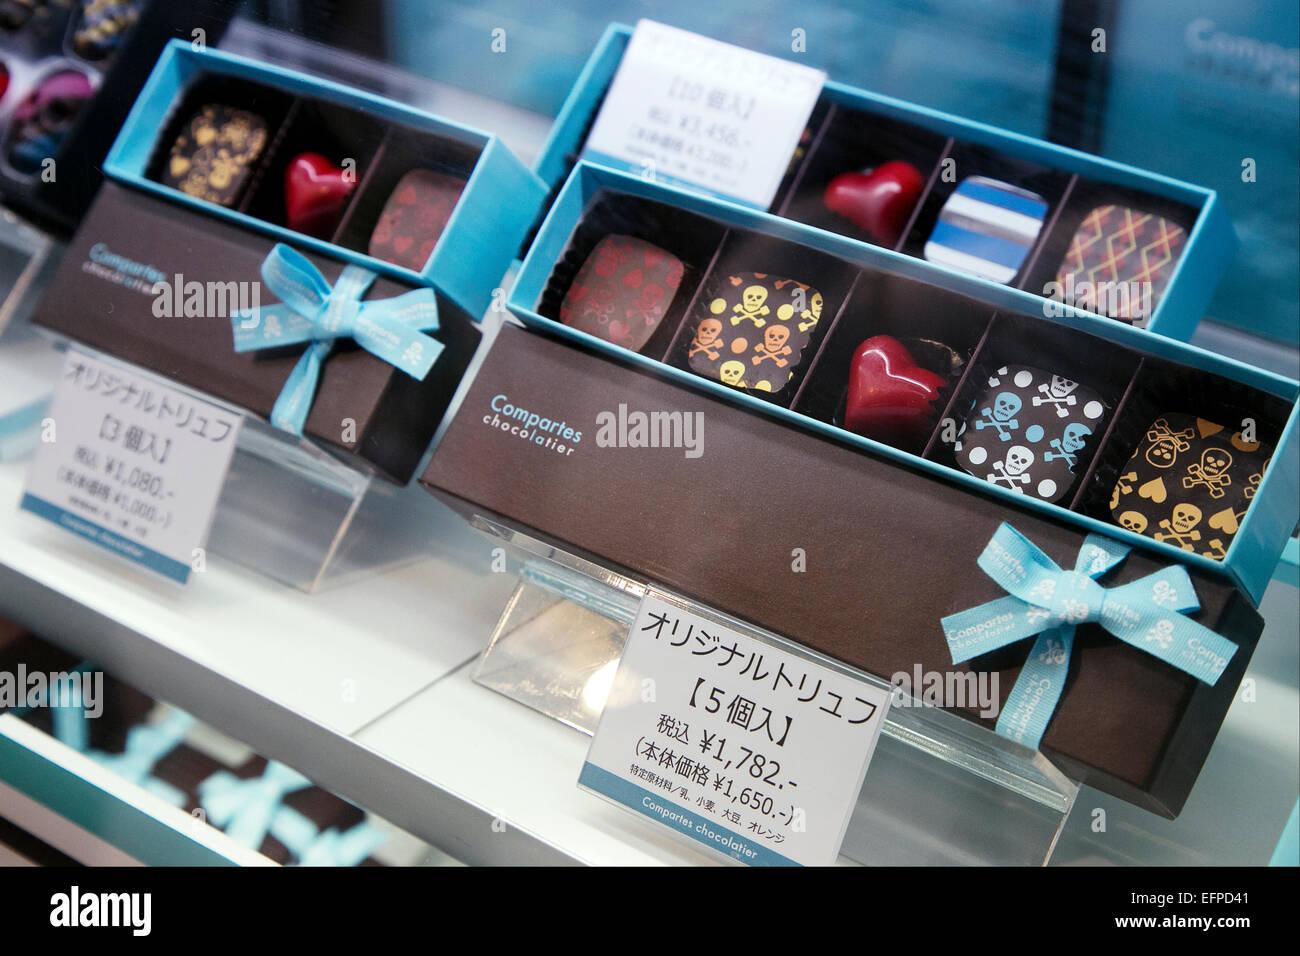 Valentine S Chocolate On Display On February 9 2015 Tokyo Japan